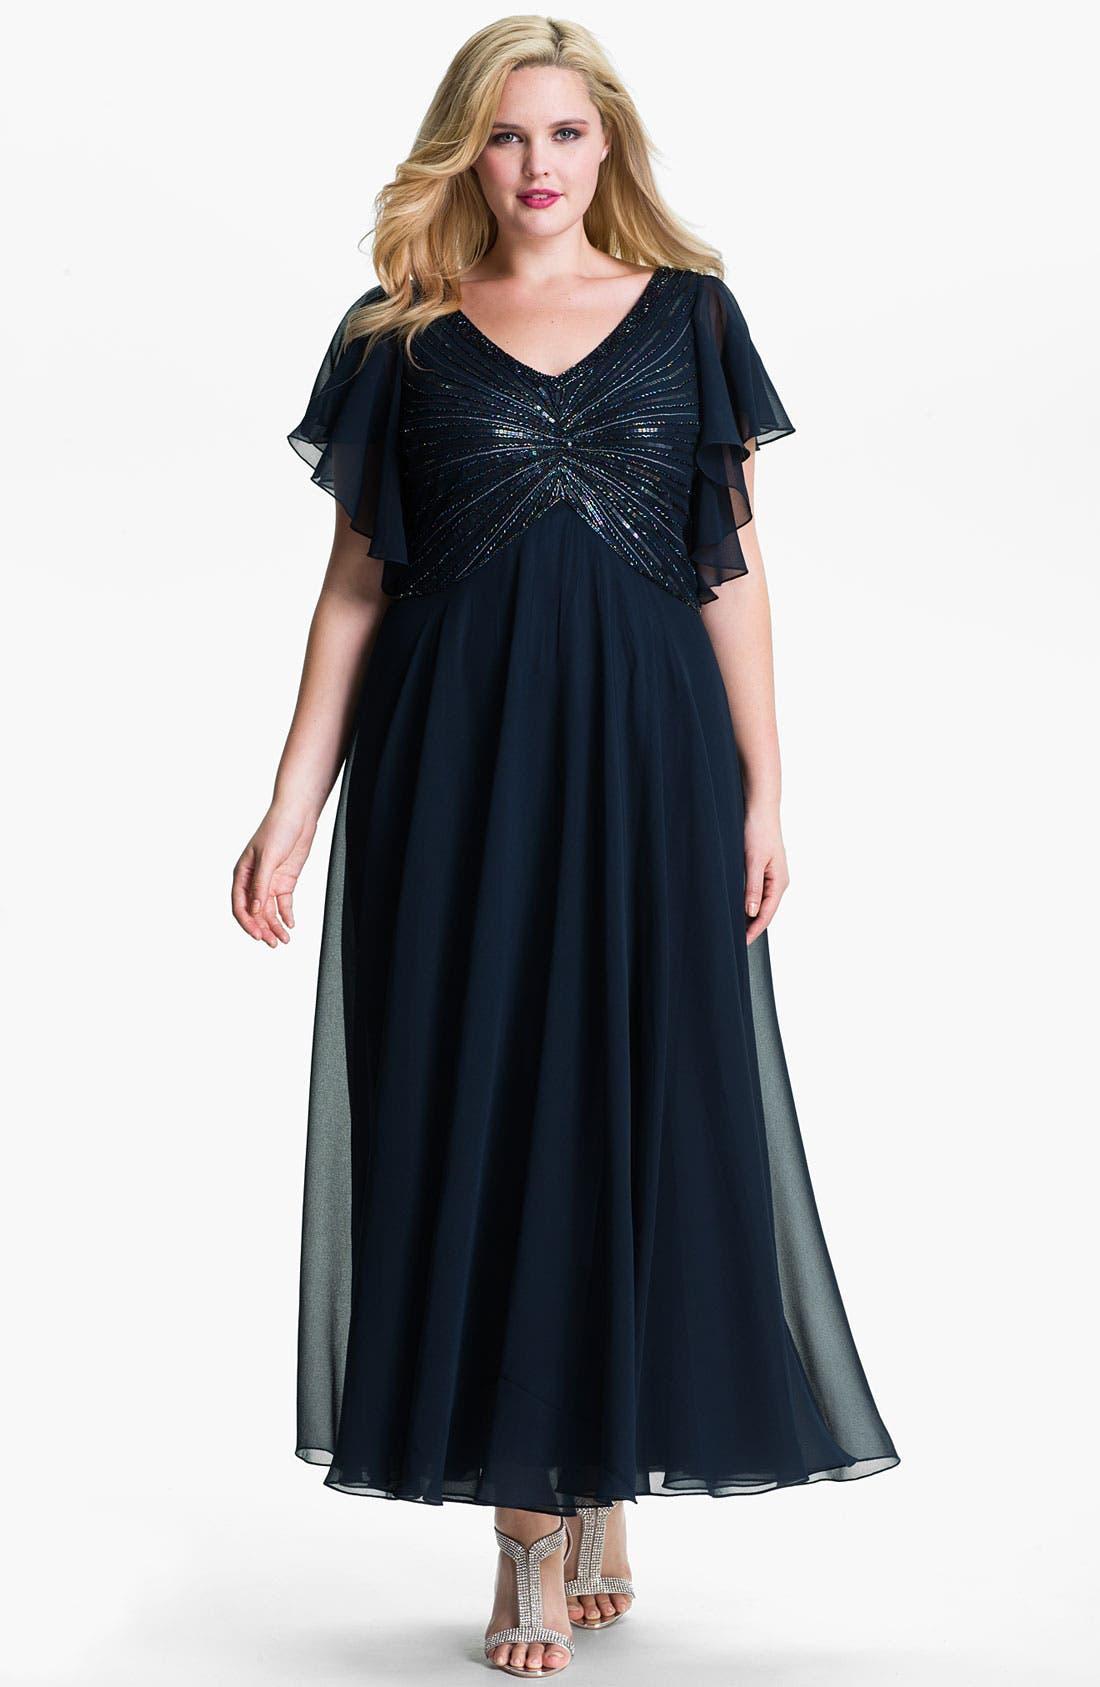 Main Image - J Kara V-Neck Sequin Bodice Dress (Plus)